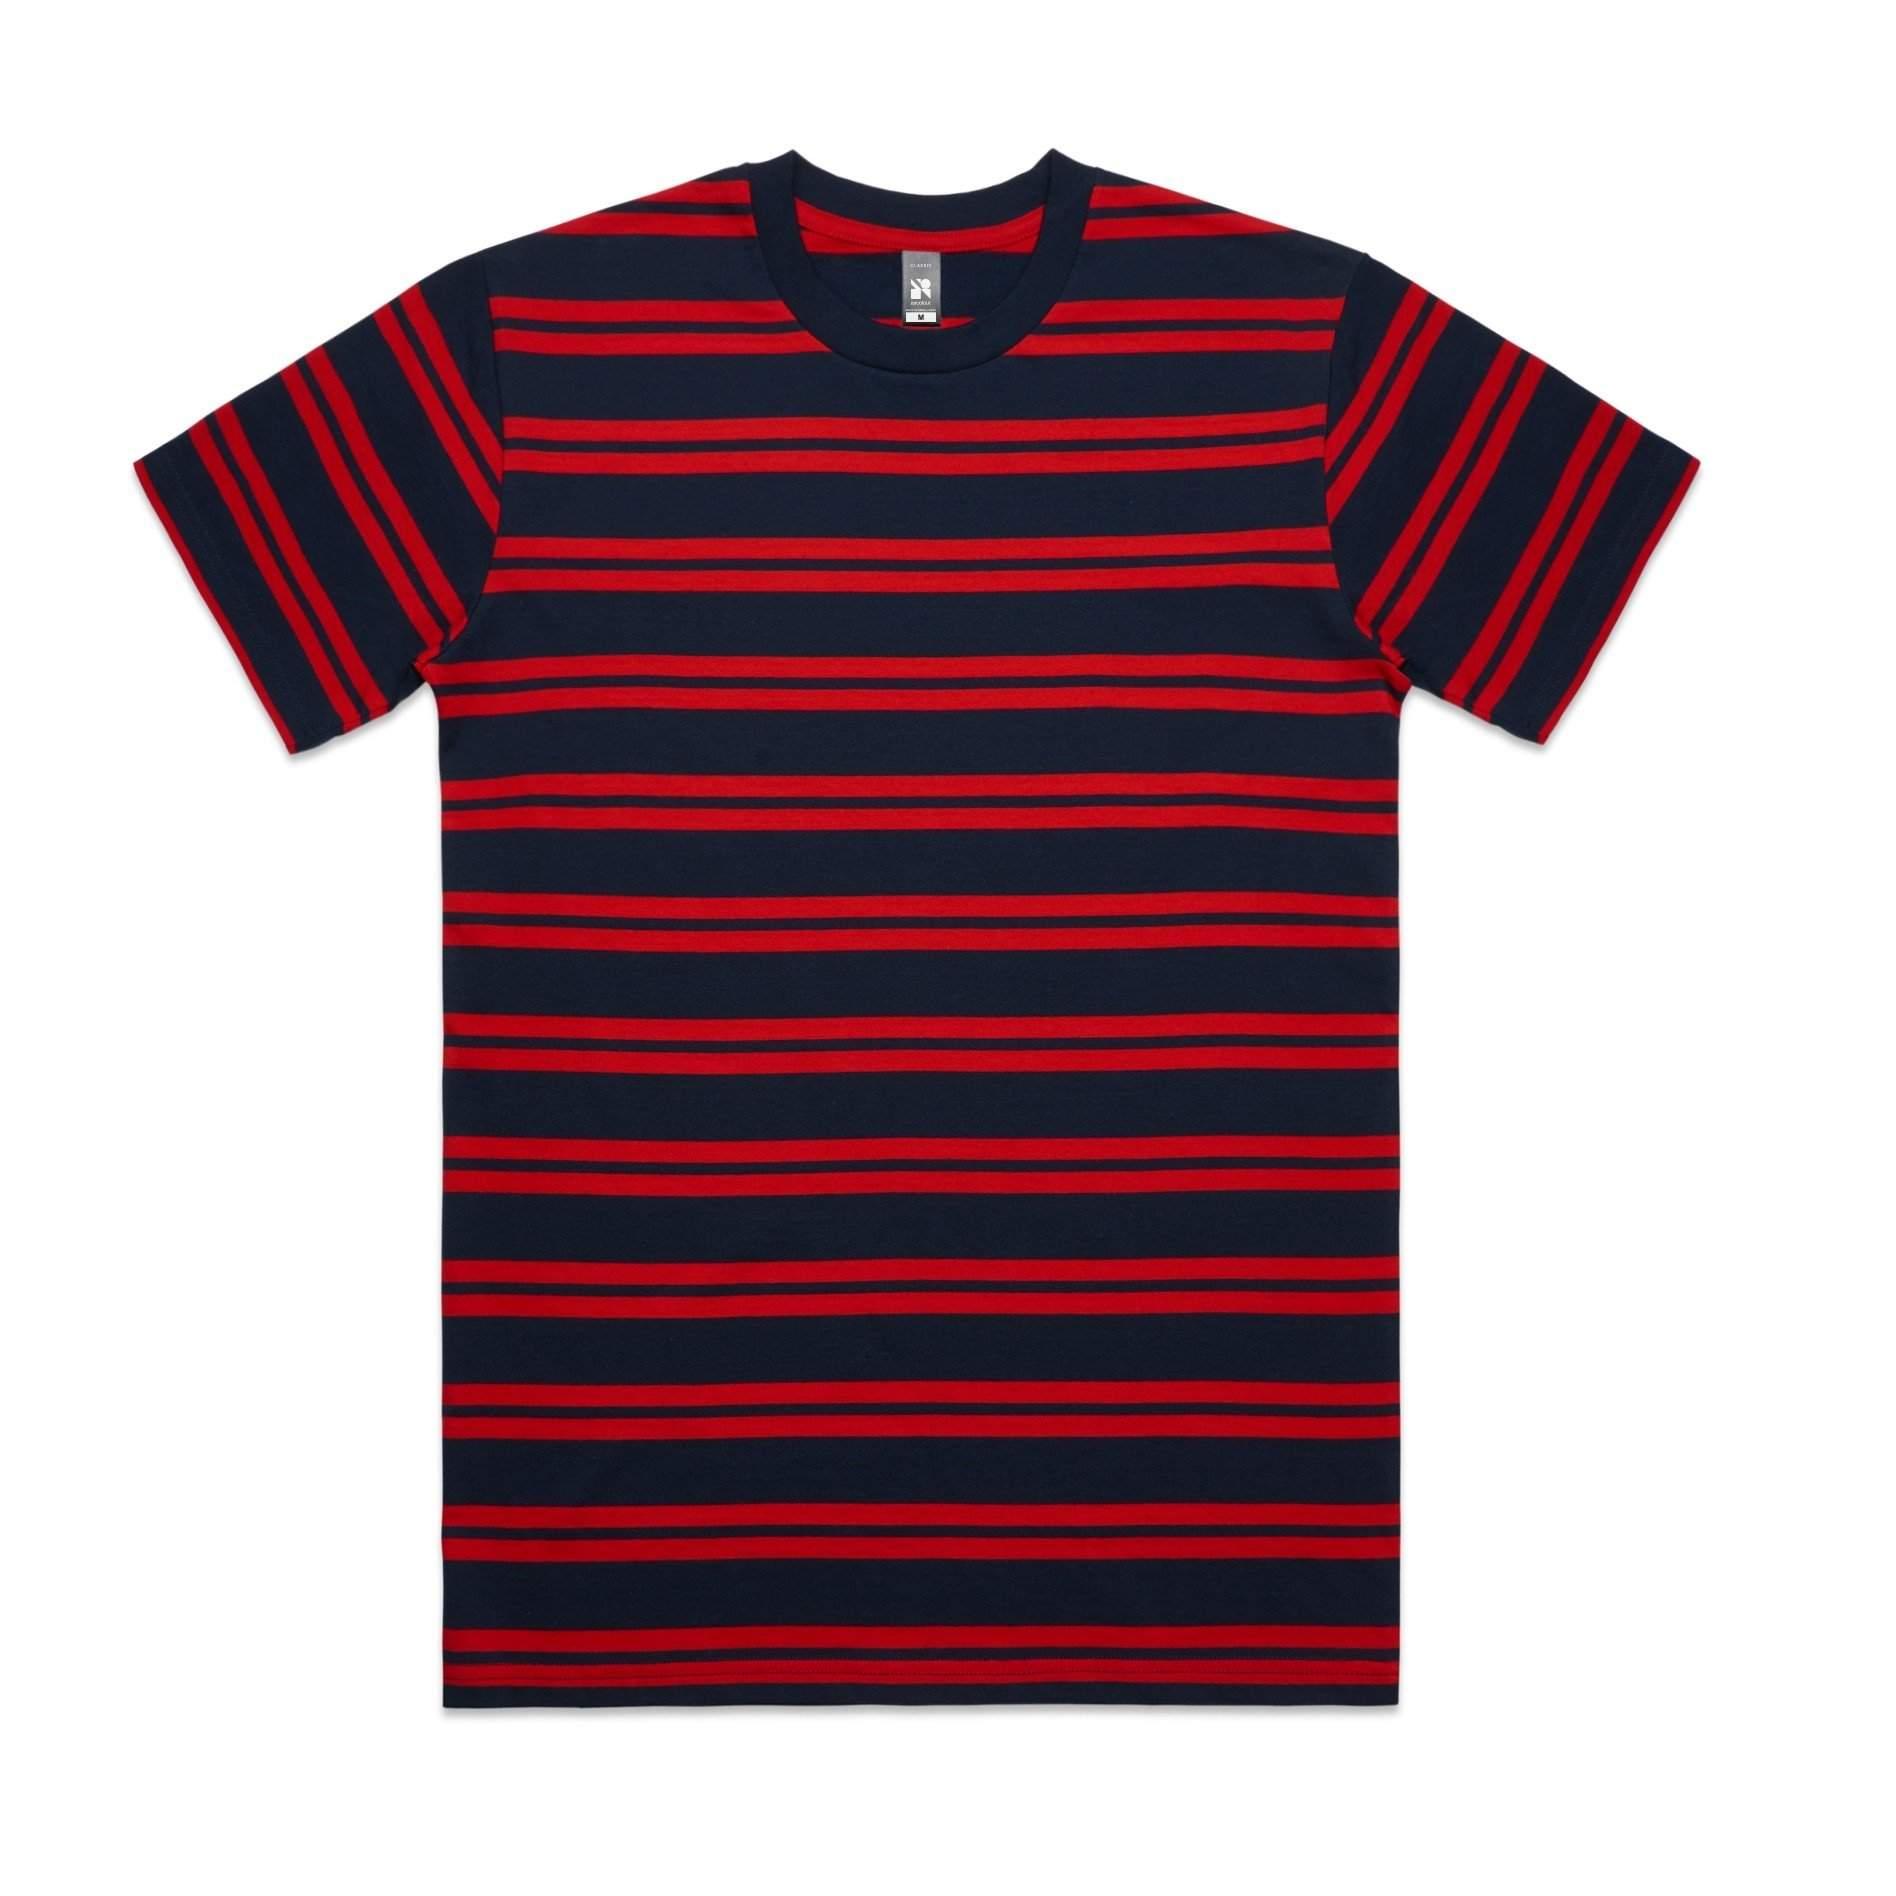 Custom Printed T Shirts Sydney